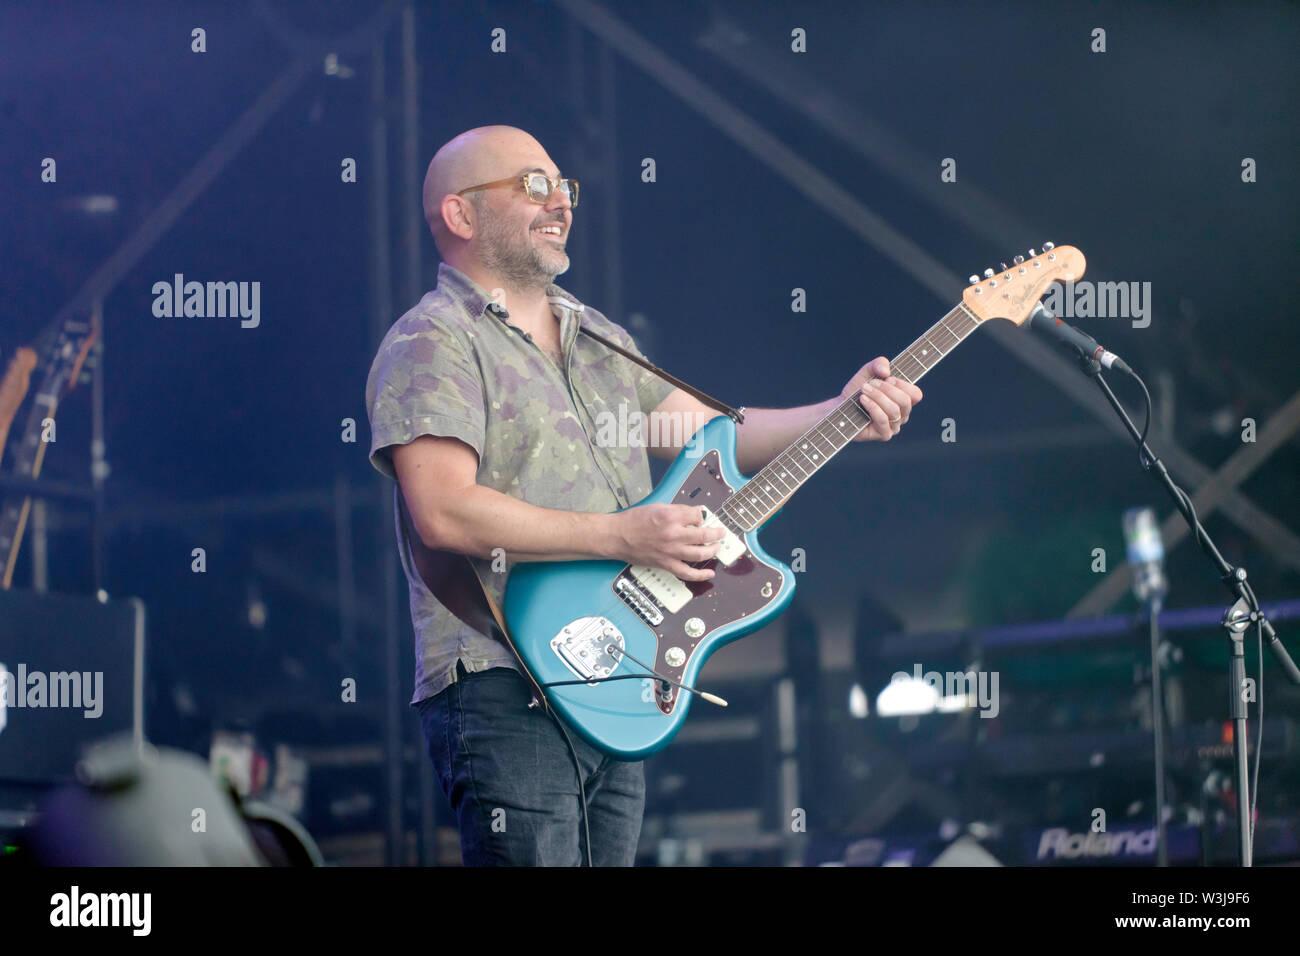 Ross Godfrey mit Morcheeba, auf der Hauptbühne am OnBlackheath Music Festival 2019 Stockbild